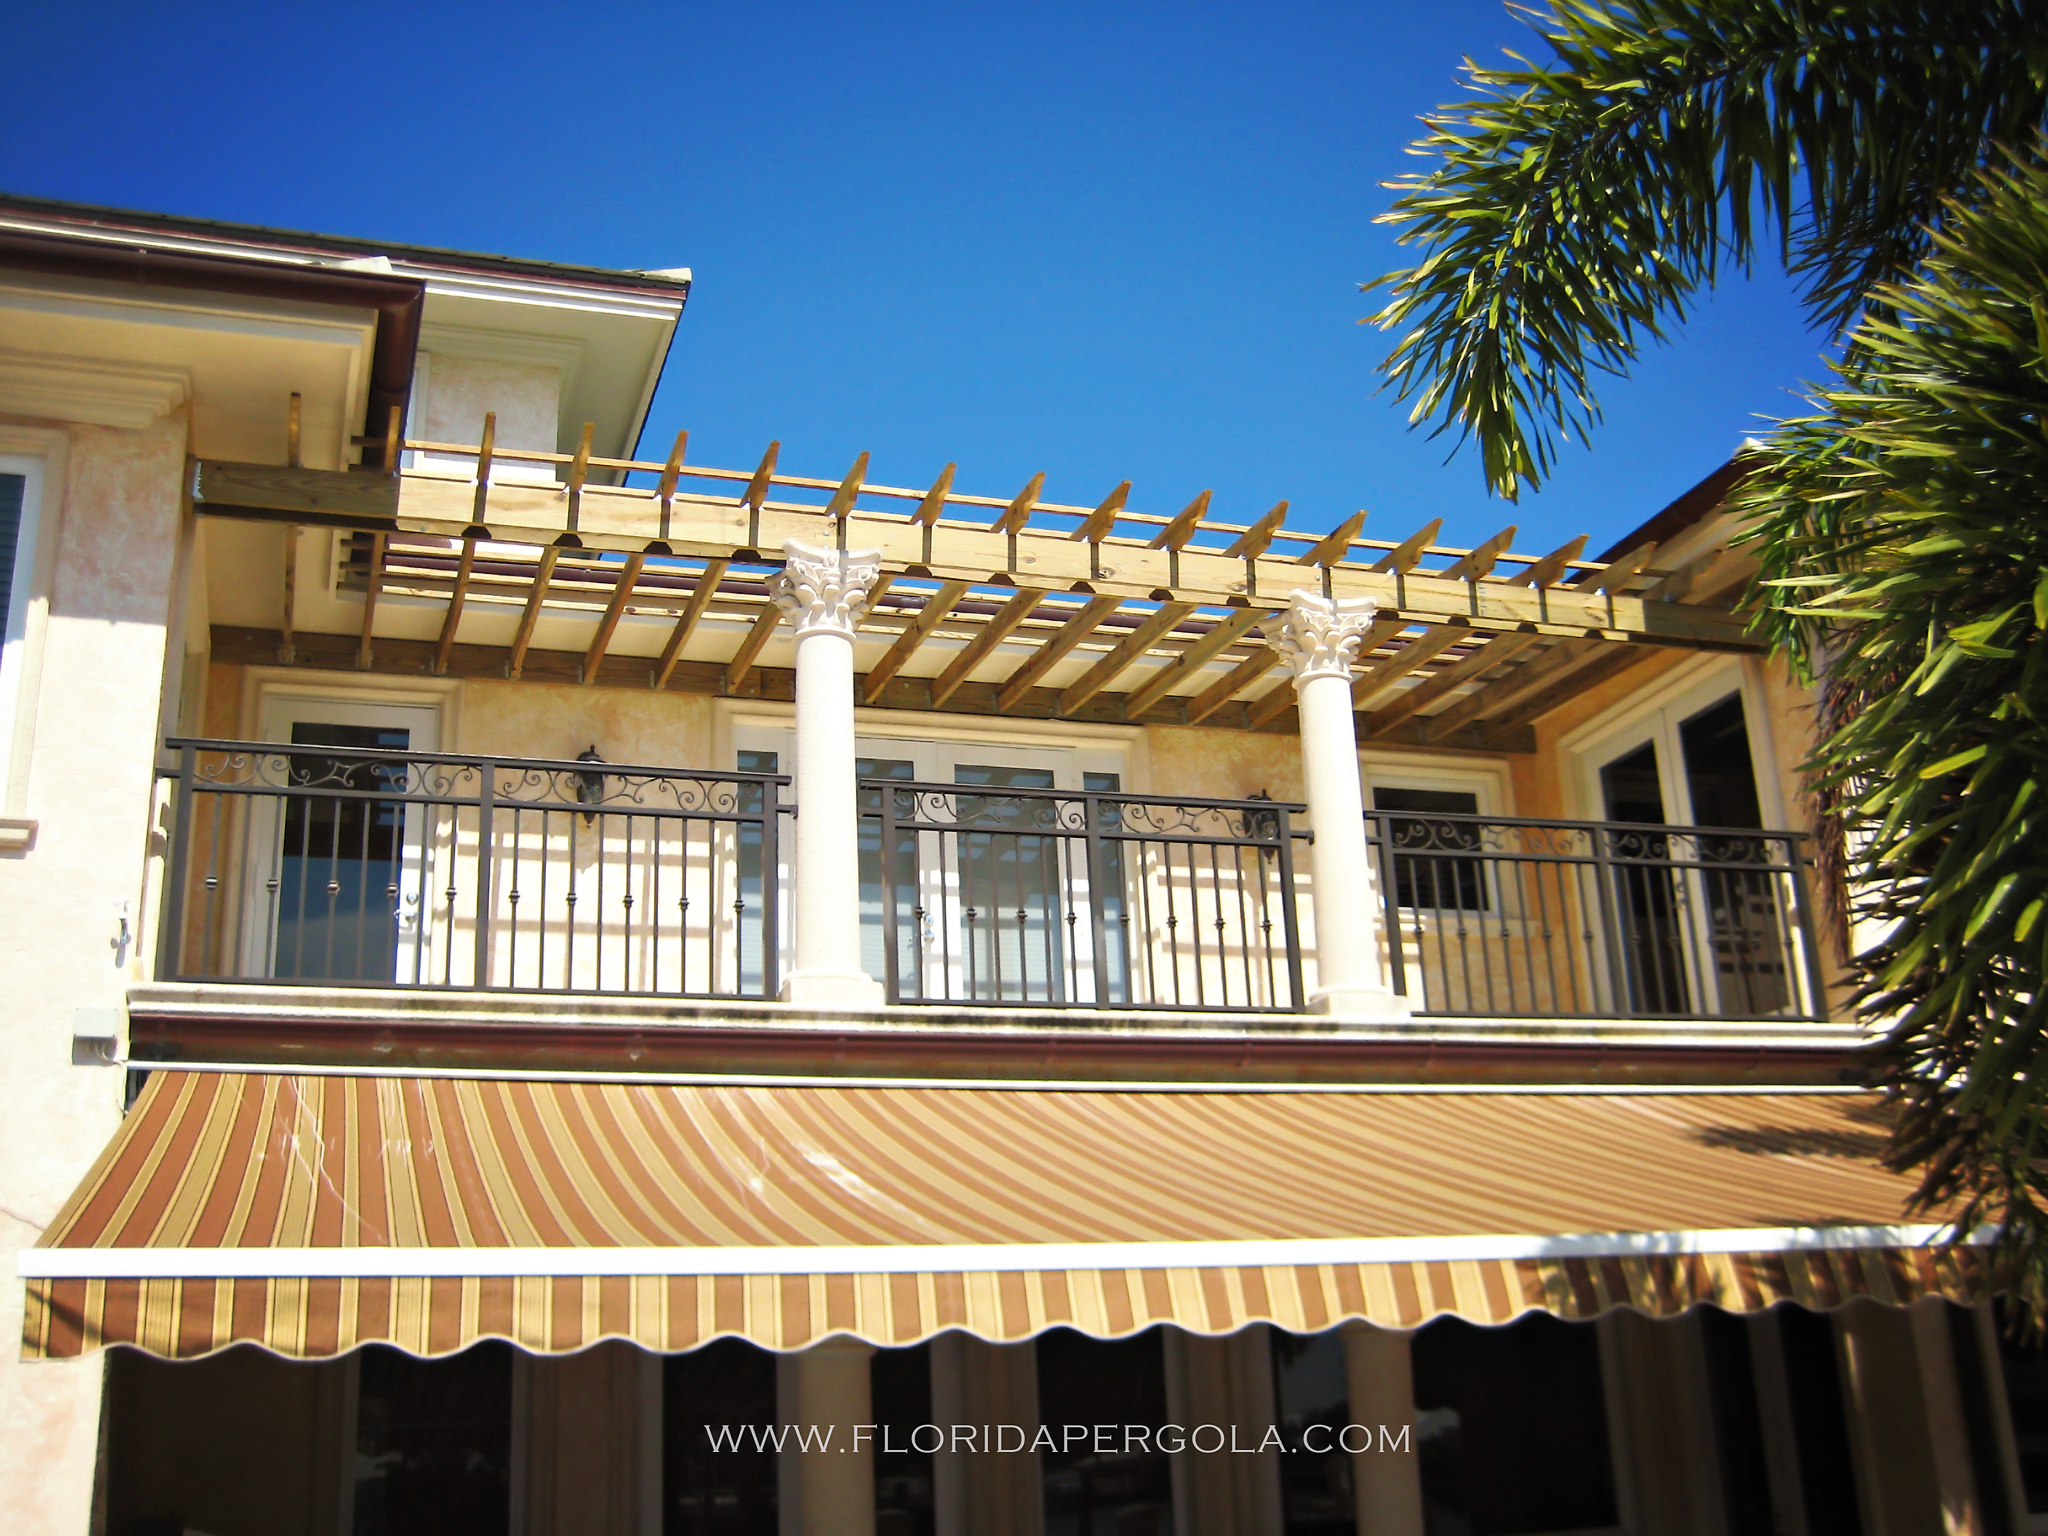 Attached Balcony Pergola